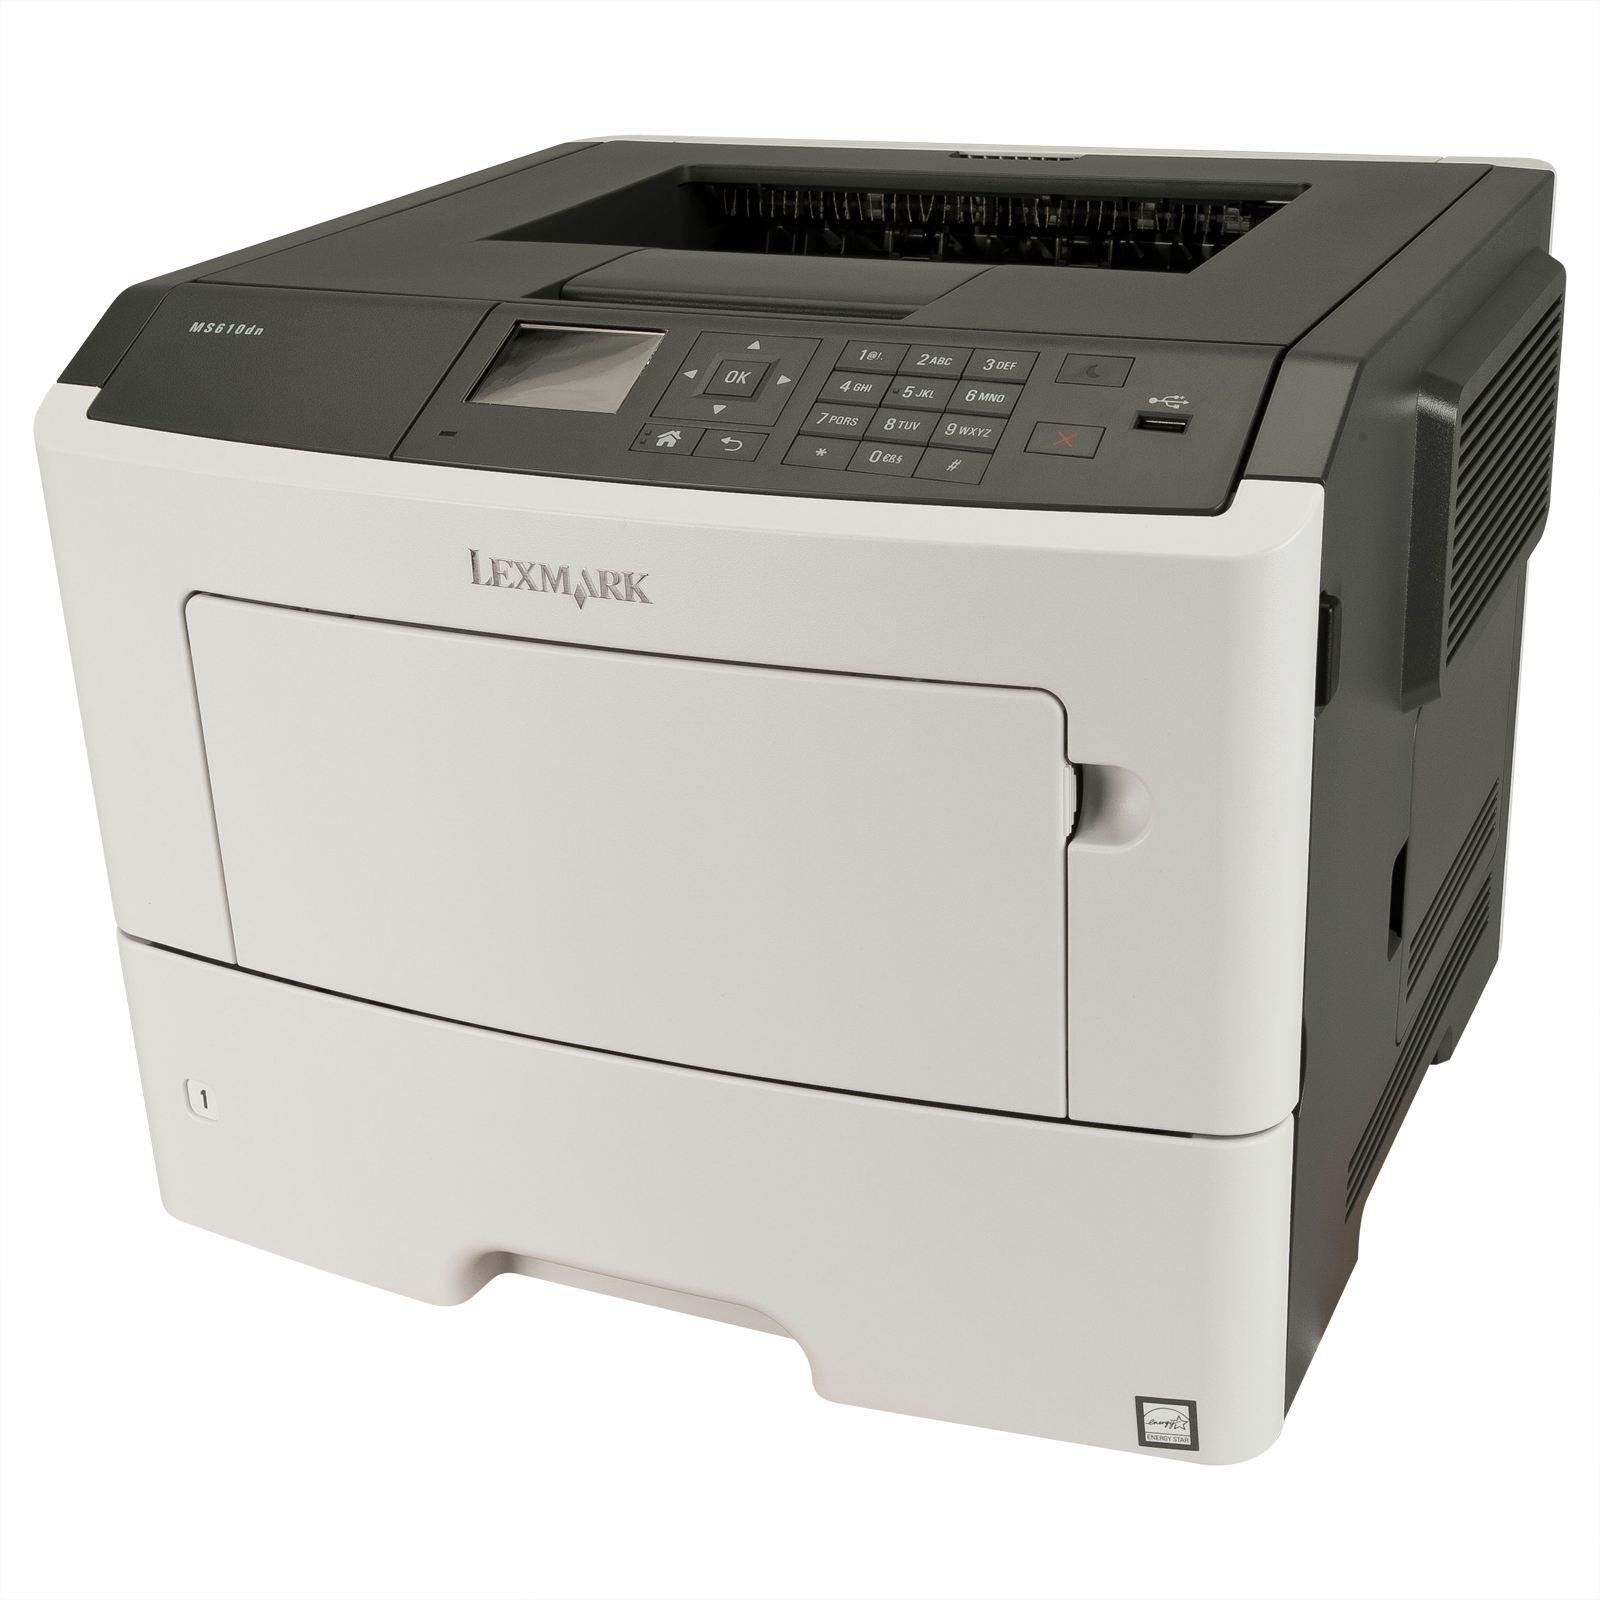 Imprimanta LaserJet Monocrom Lexmark MS610dn, A4, 16.000 pagini/luna, 1200 x 1200 DPI, Duplex, Network, USB,  Pagini Printate 0-50k, 2 Ani Garantie, Refurbished - imaginea 1